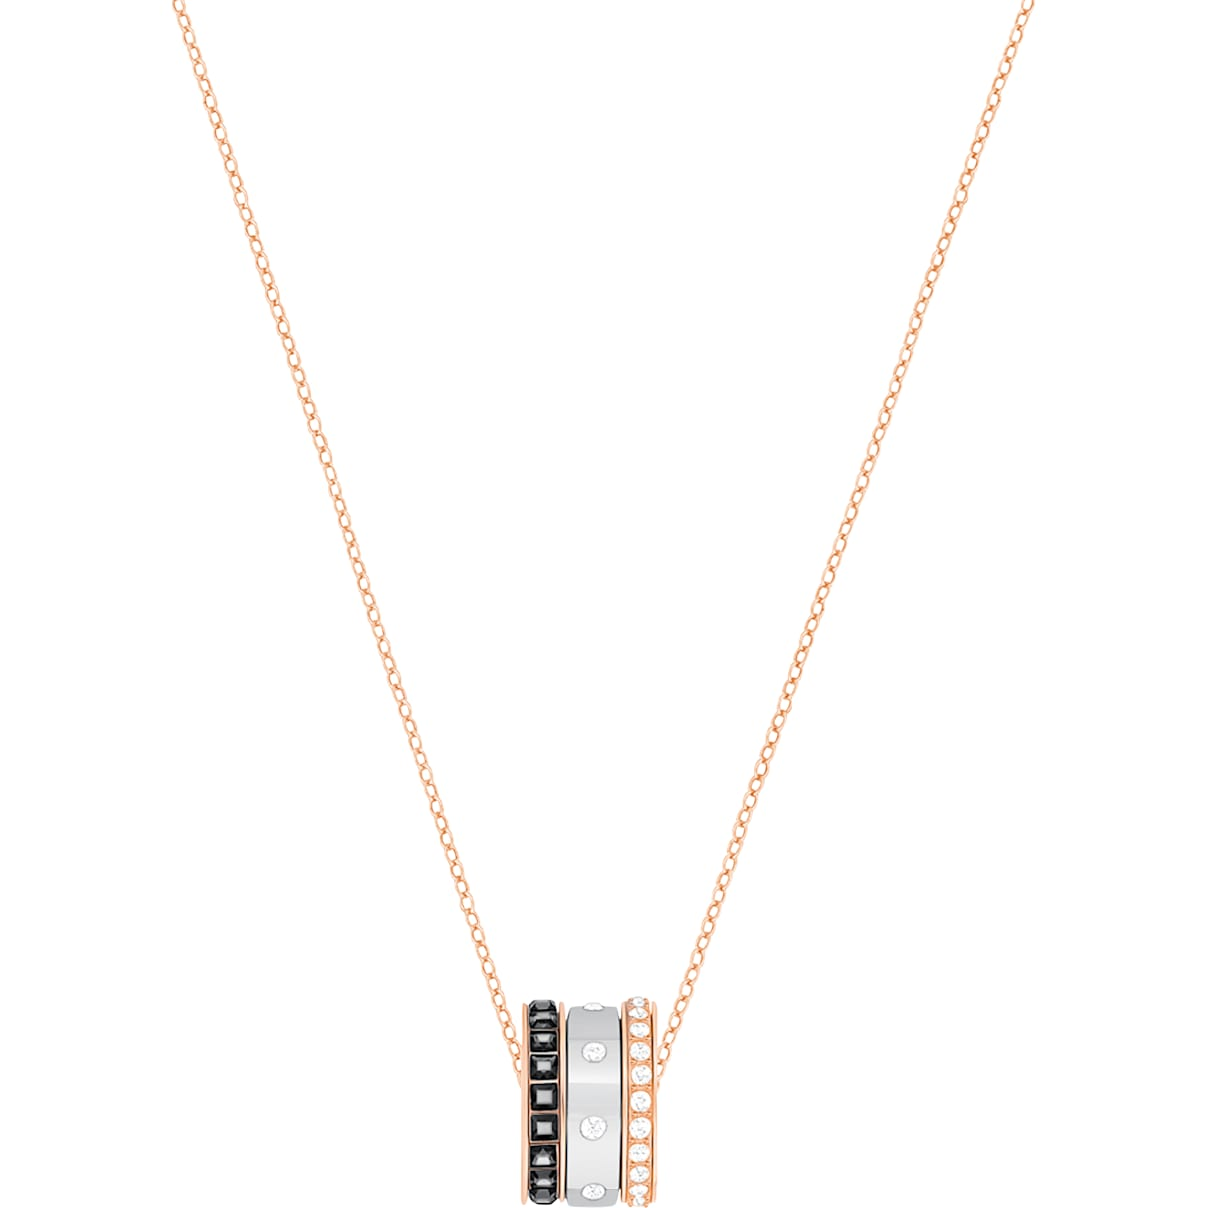 Swarovski Hint Pendant, Multi-colored, Mixed metal finish